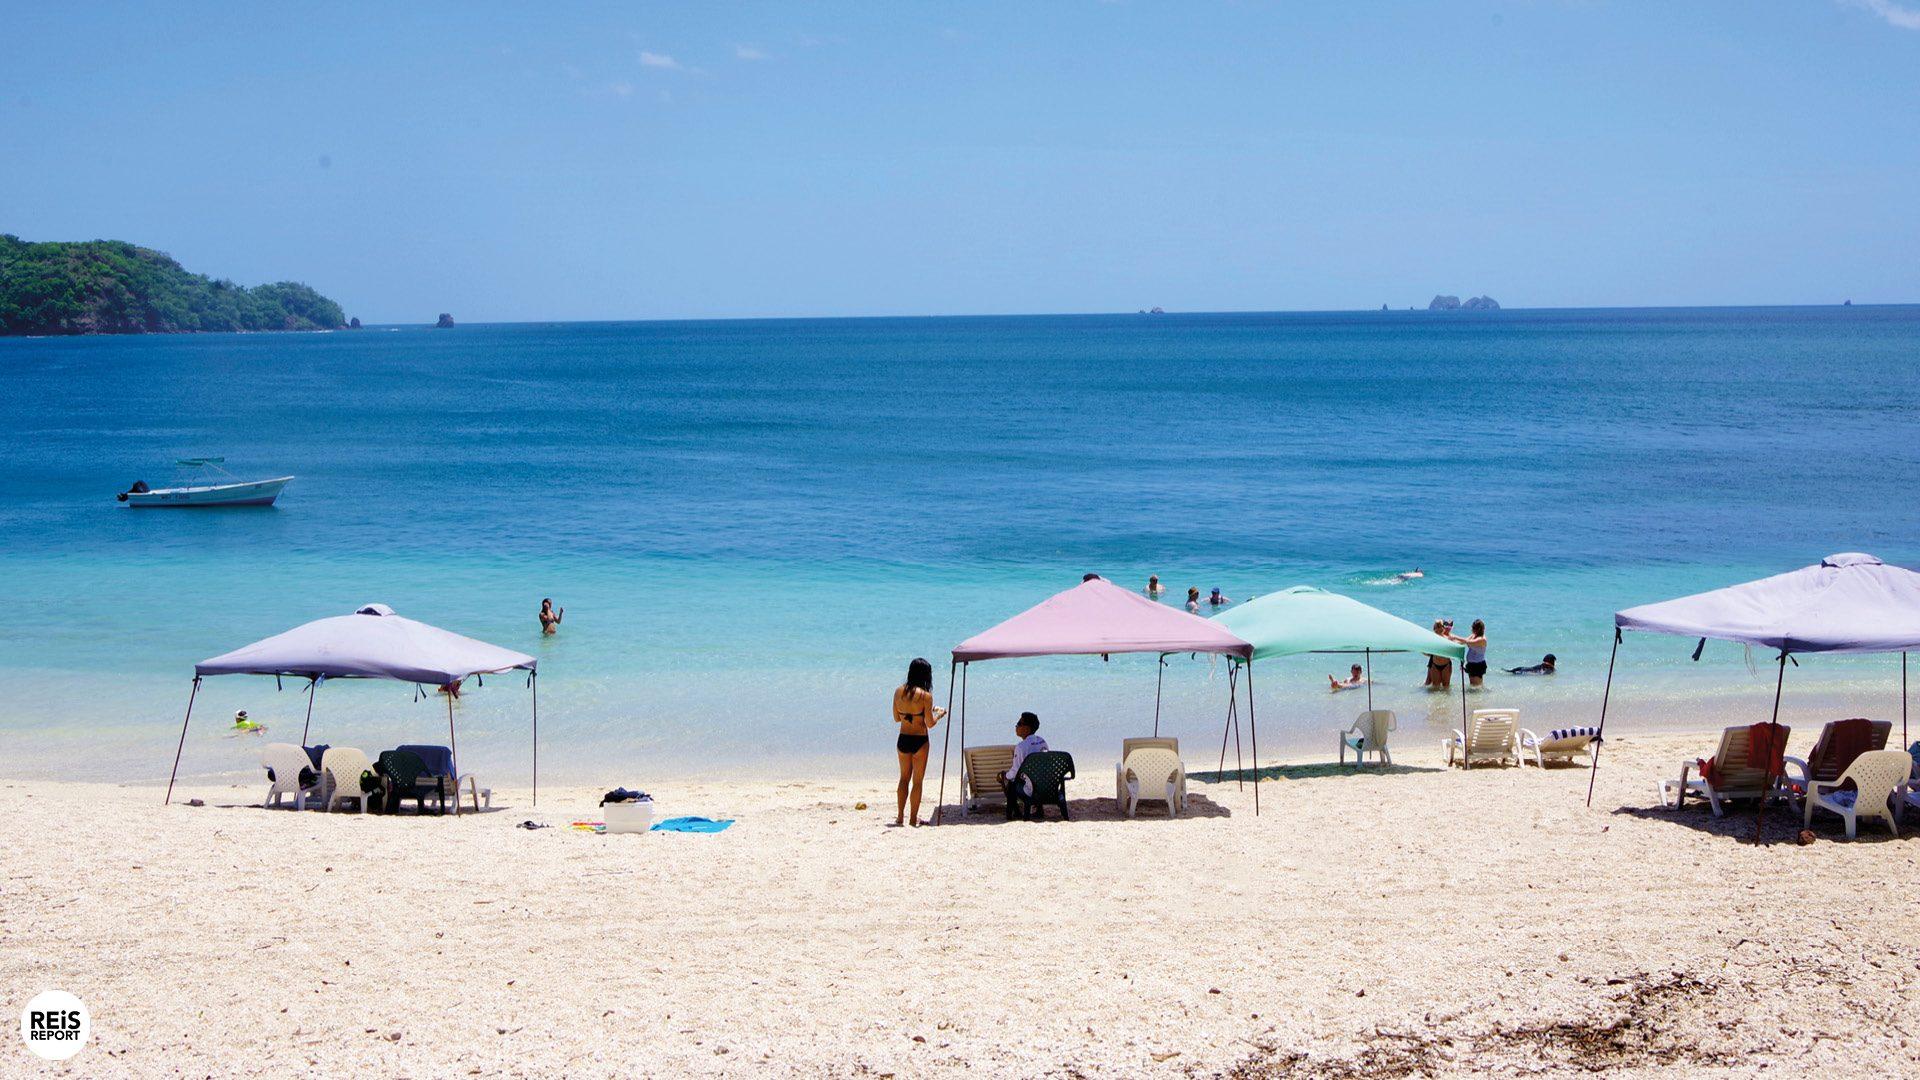 playa conchal costa rica